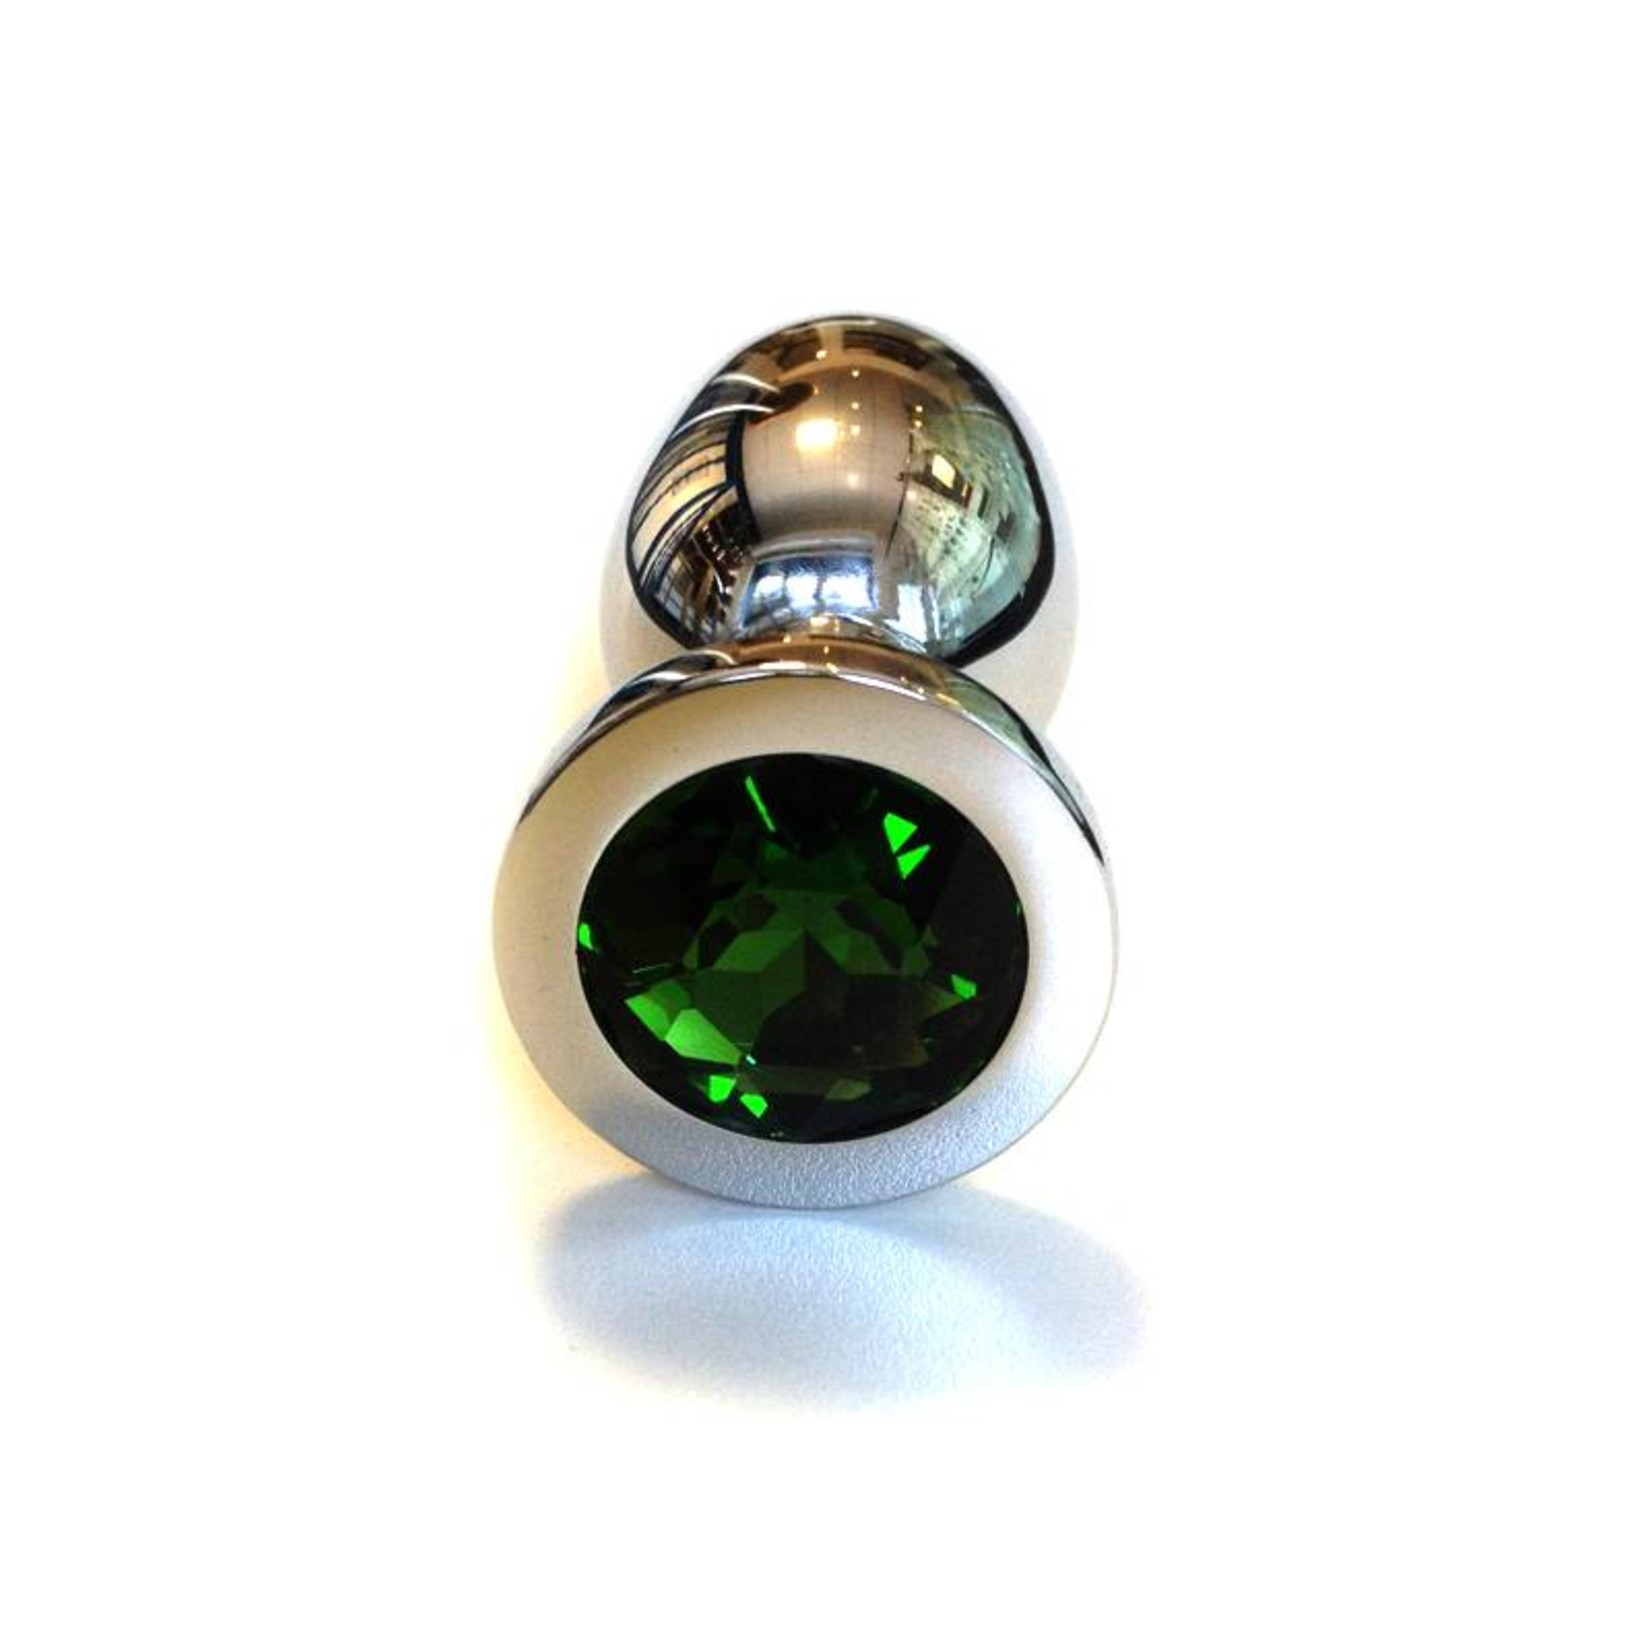 KIOTOS Steel Jewel Buttplug Large Green